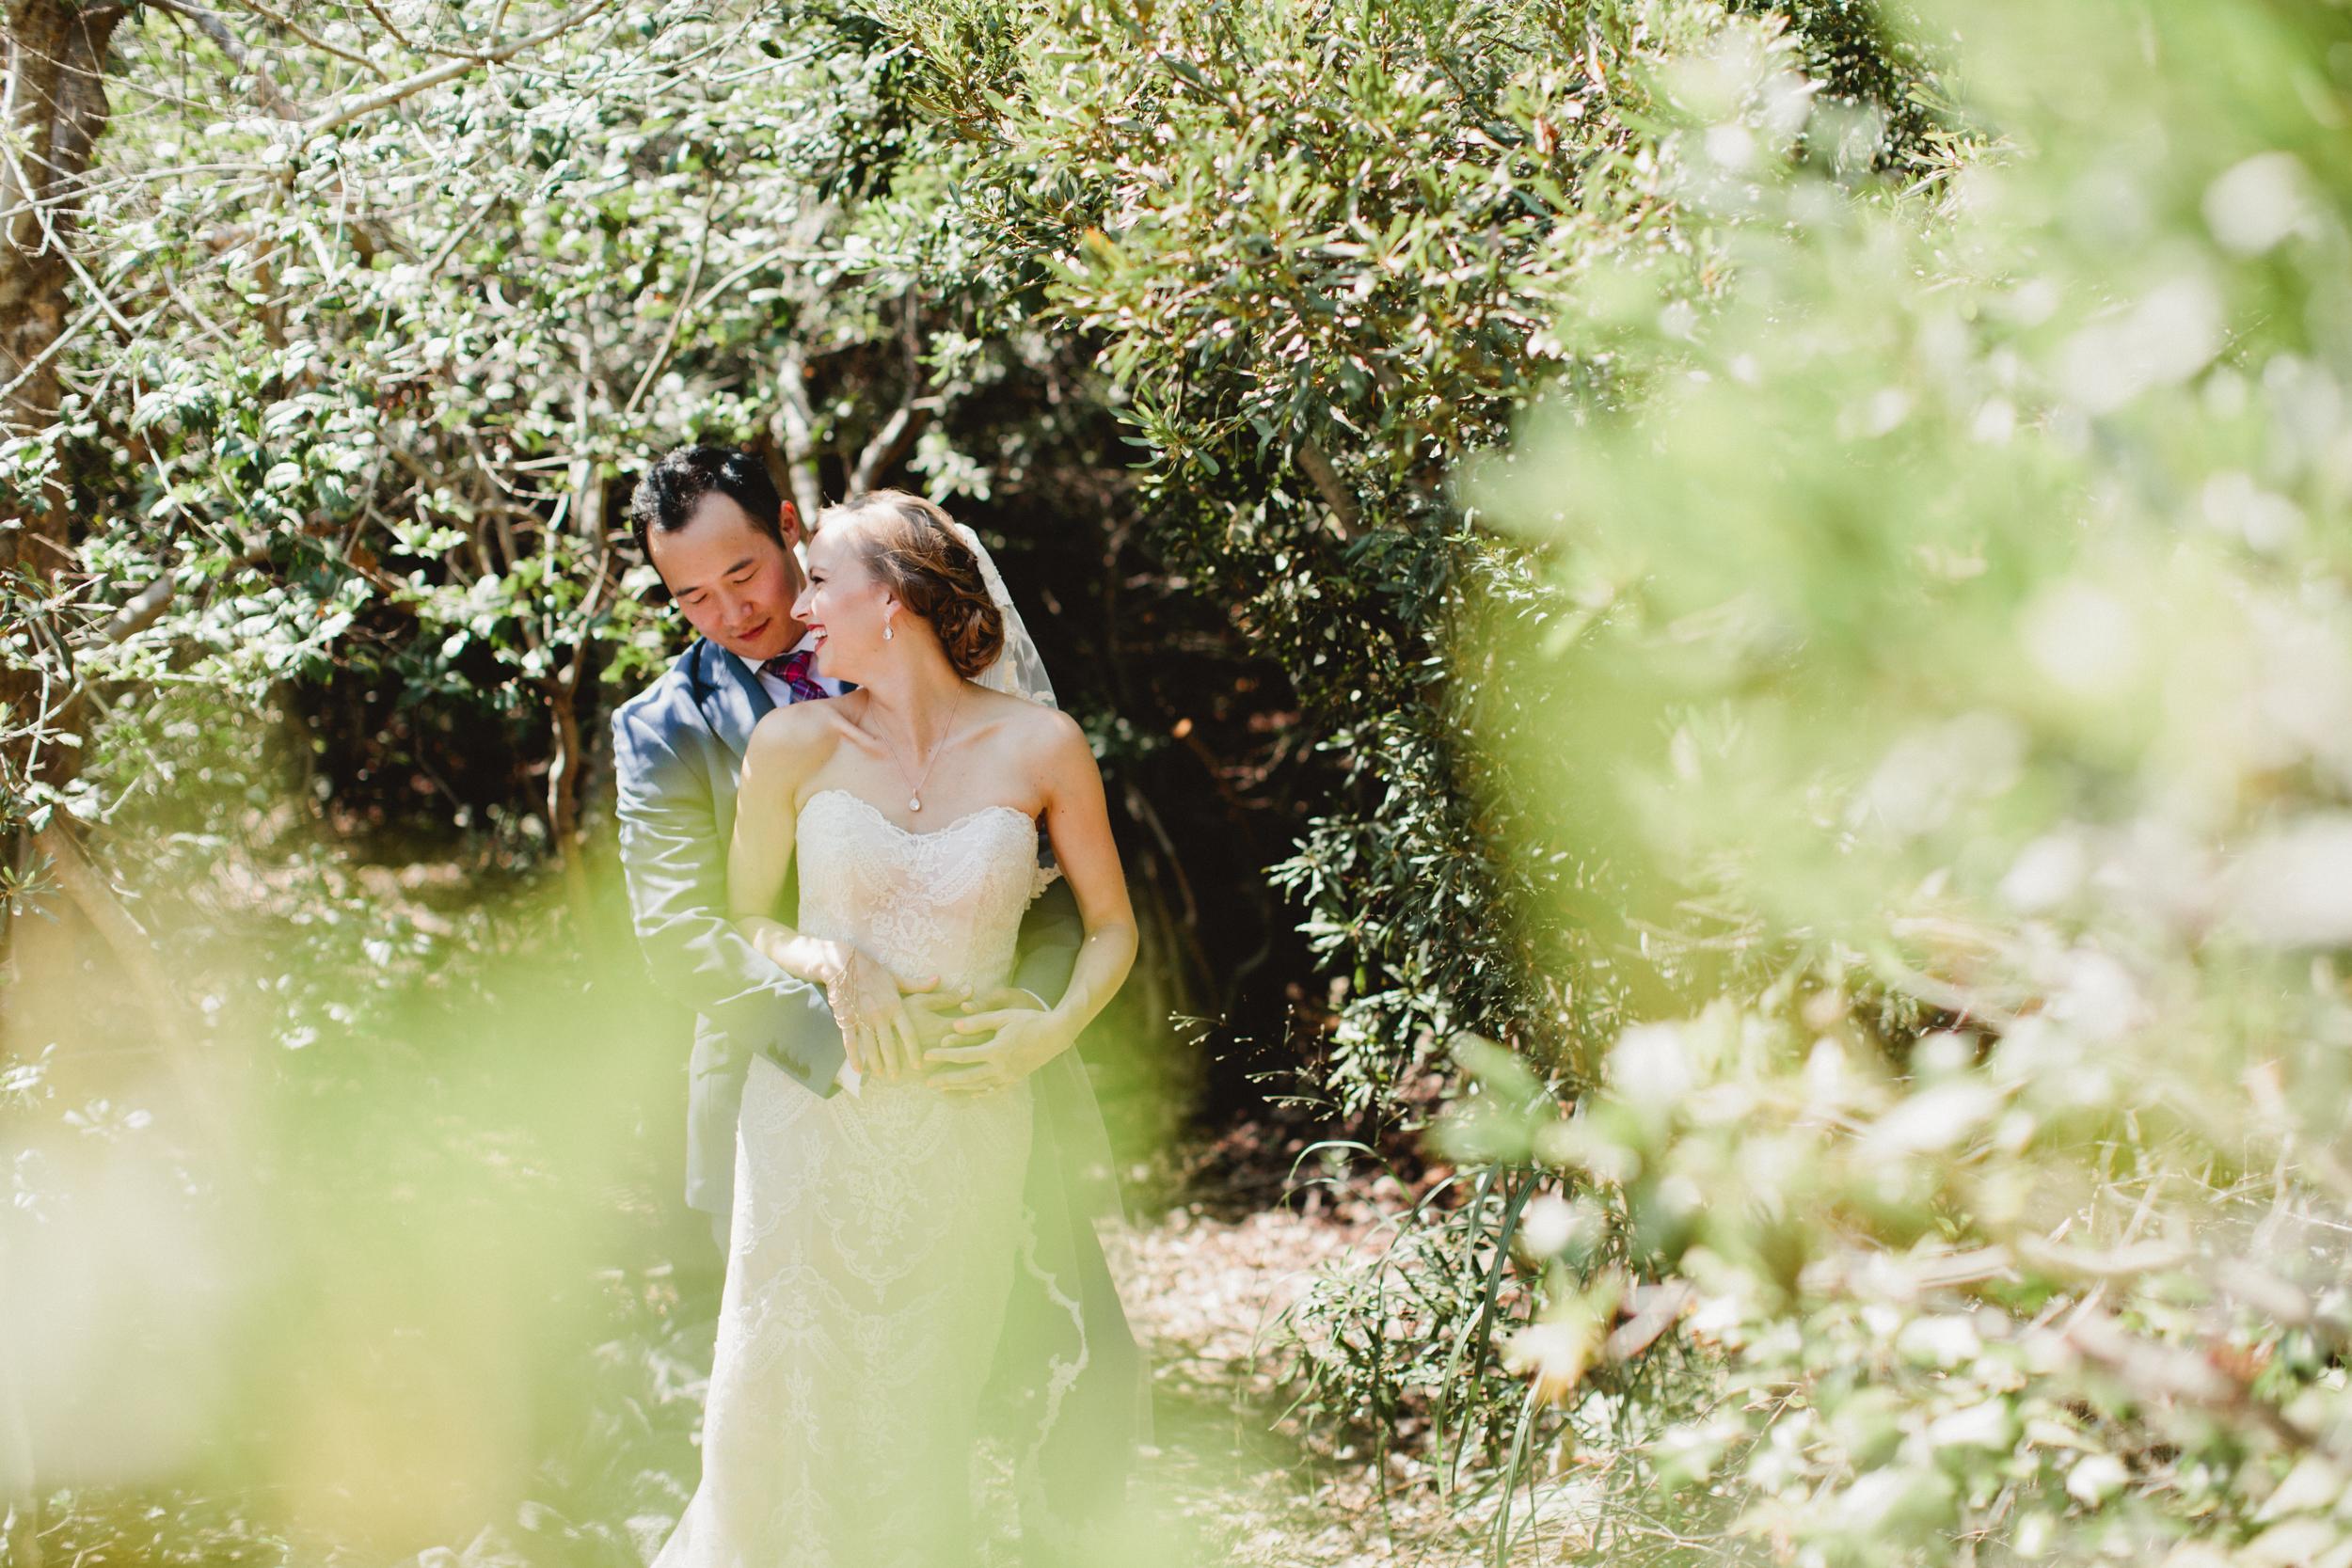 Maine-Wedding-Photographer-973.jpg